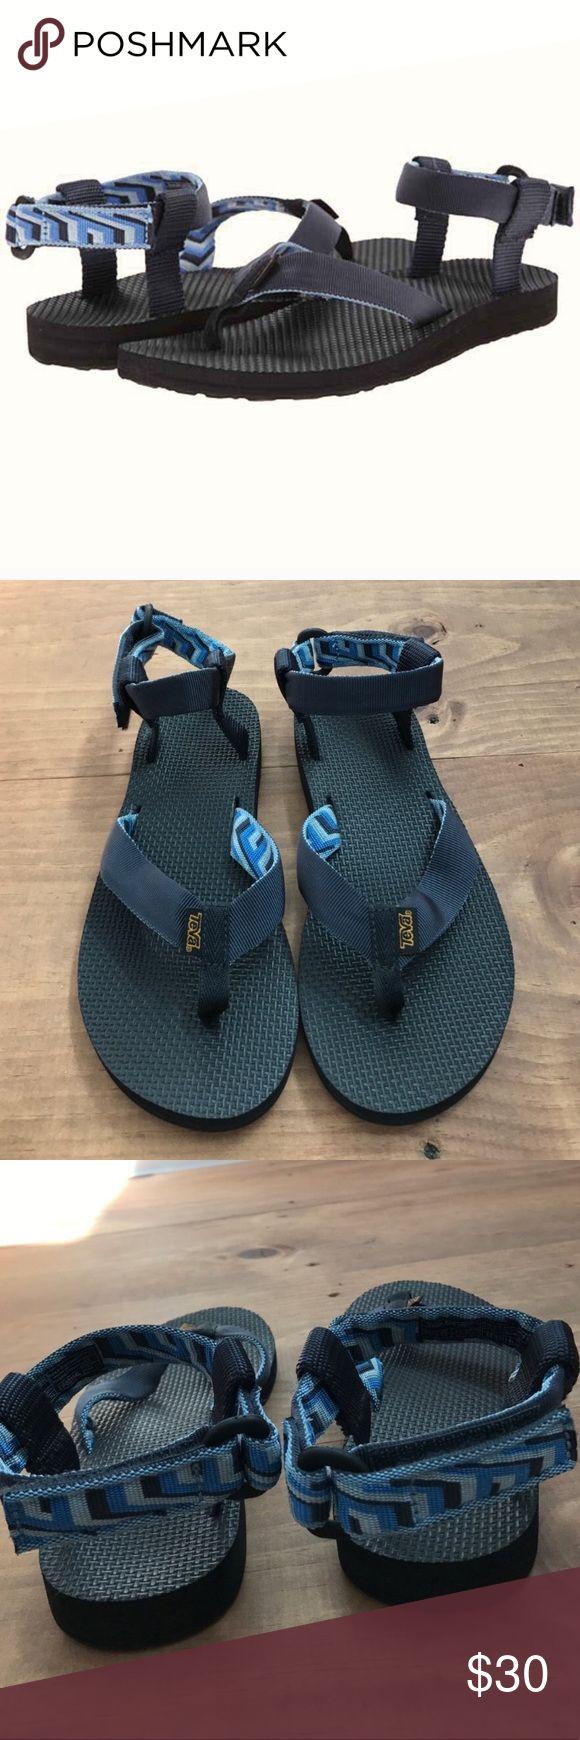 Teva Sandals Blue Flip Flops Size 7 For Sale in my Poshmark Closet: #shopmycloset #poshmark #fashion #shopping #style #forsale #Teva #Shoes